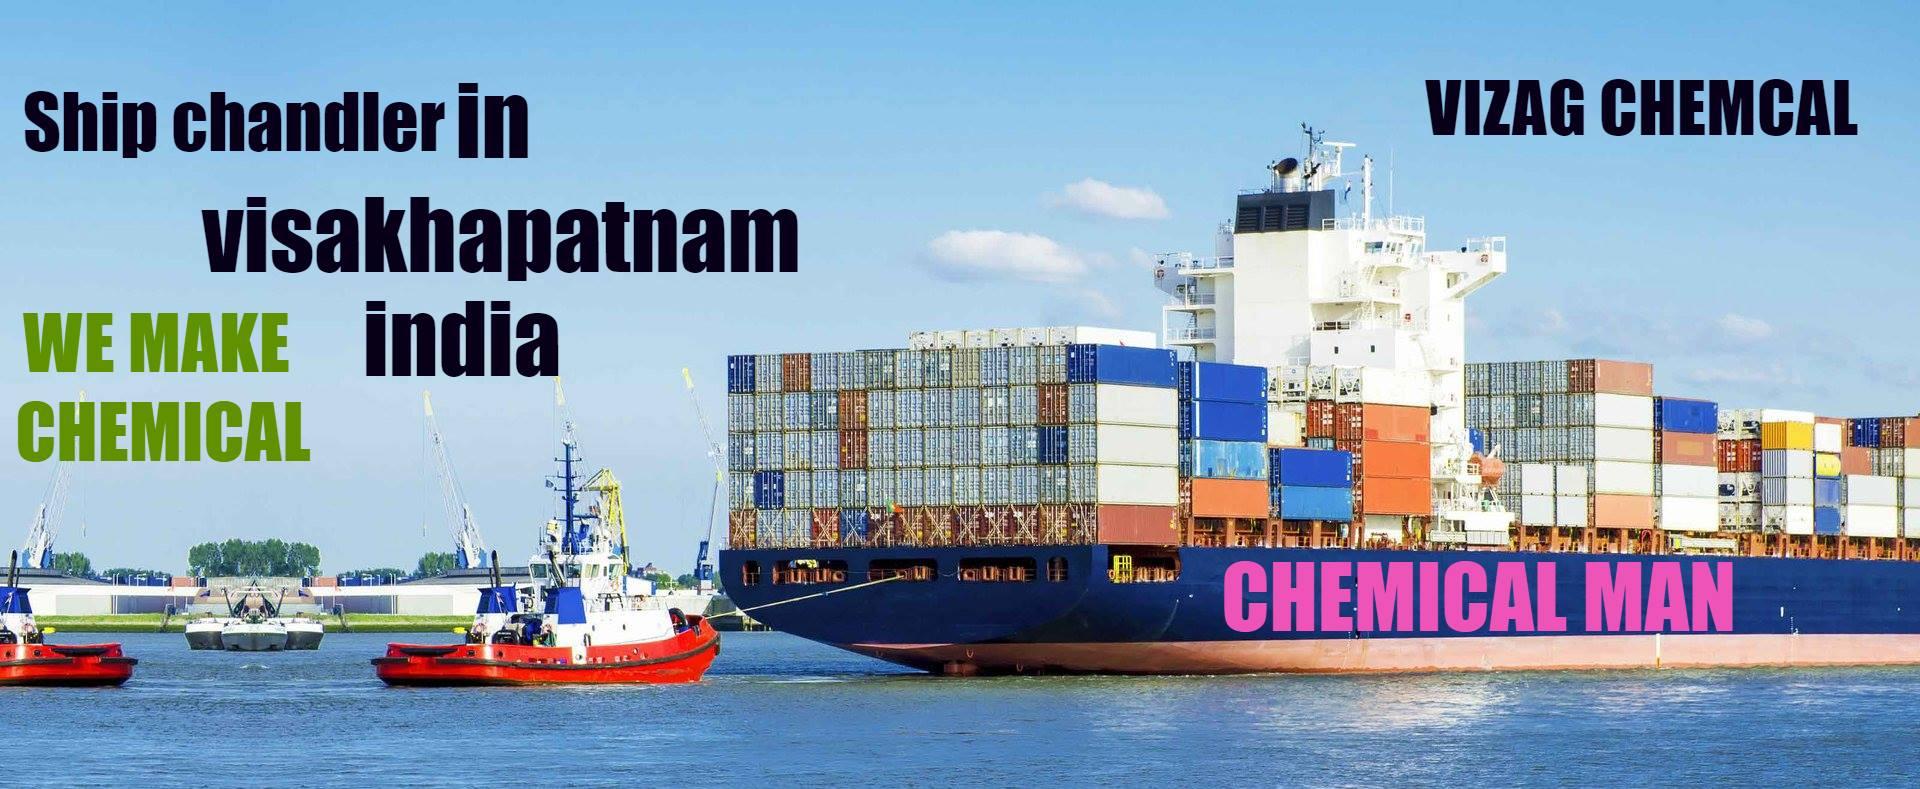 Ship chandler In Visakhapatnam India ifo Chemical Man India | Vizag